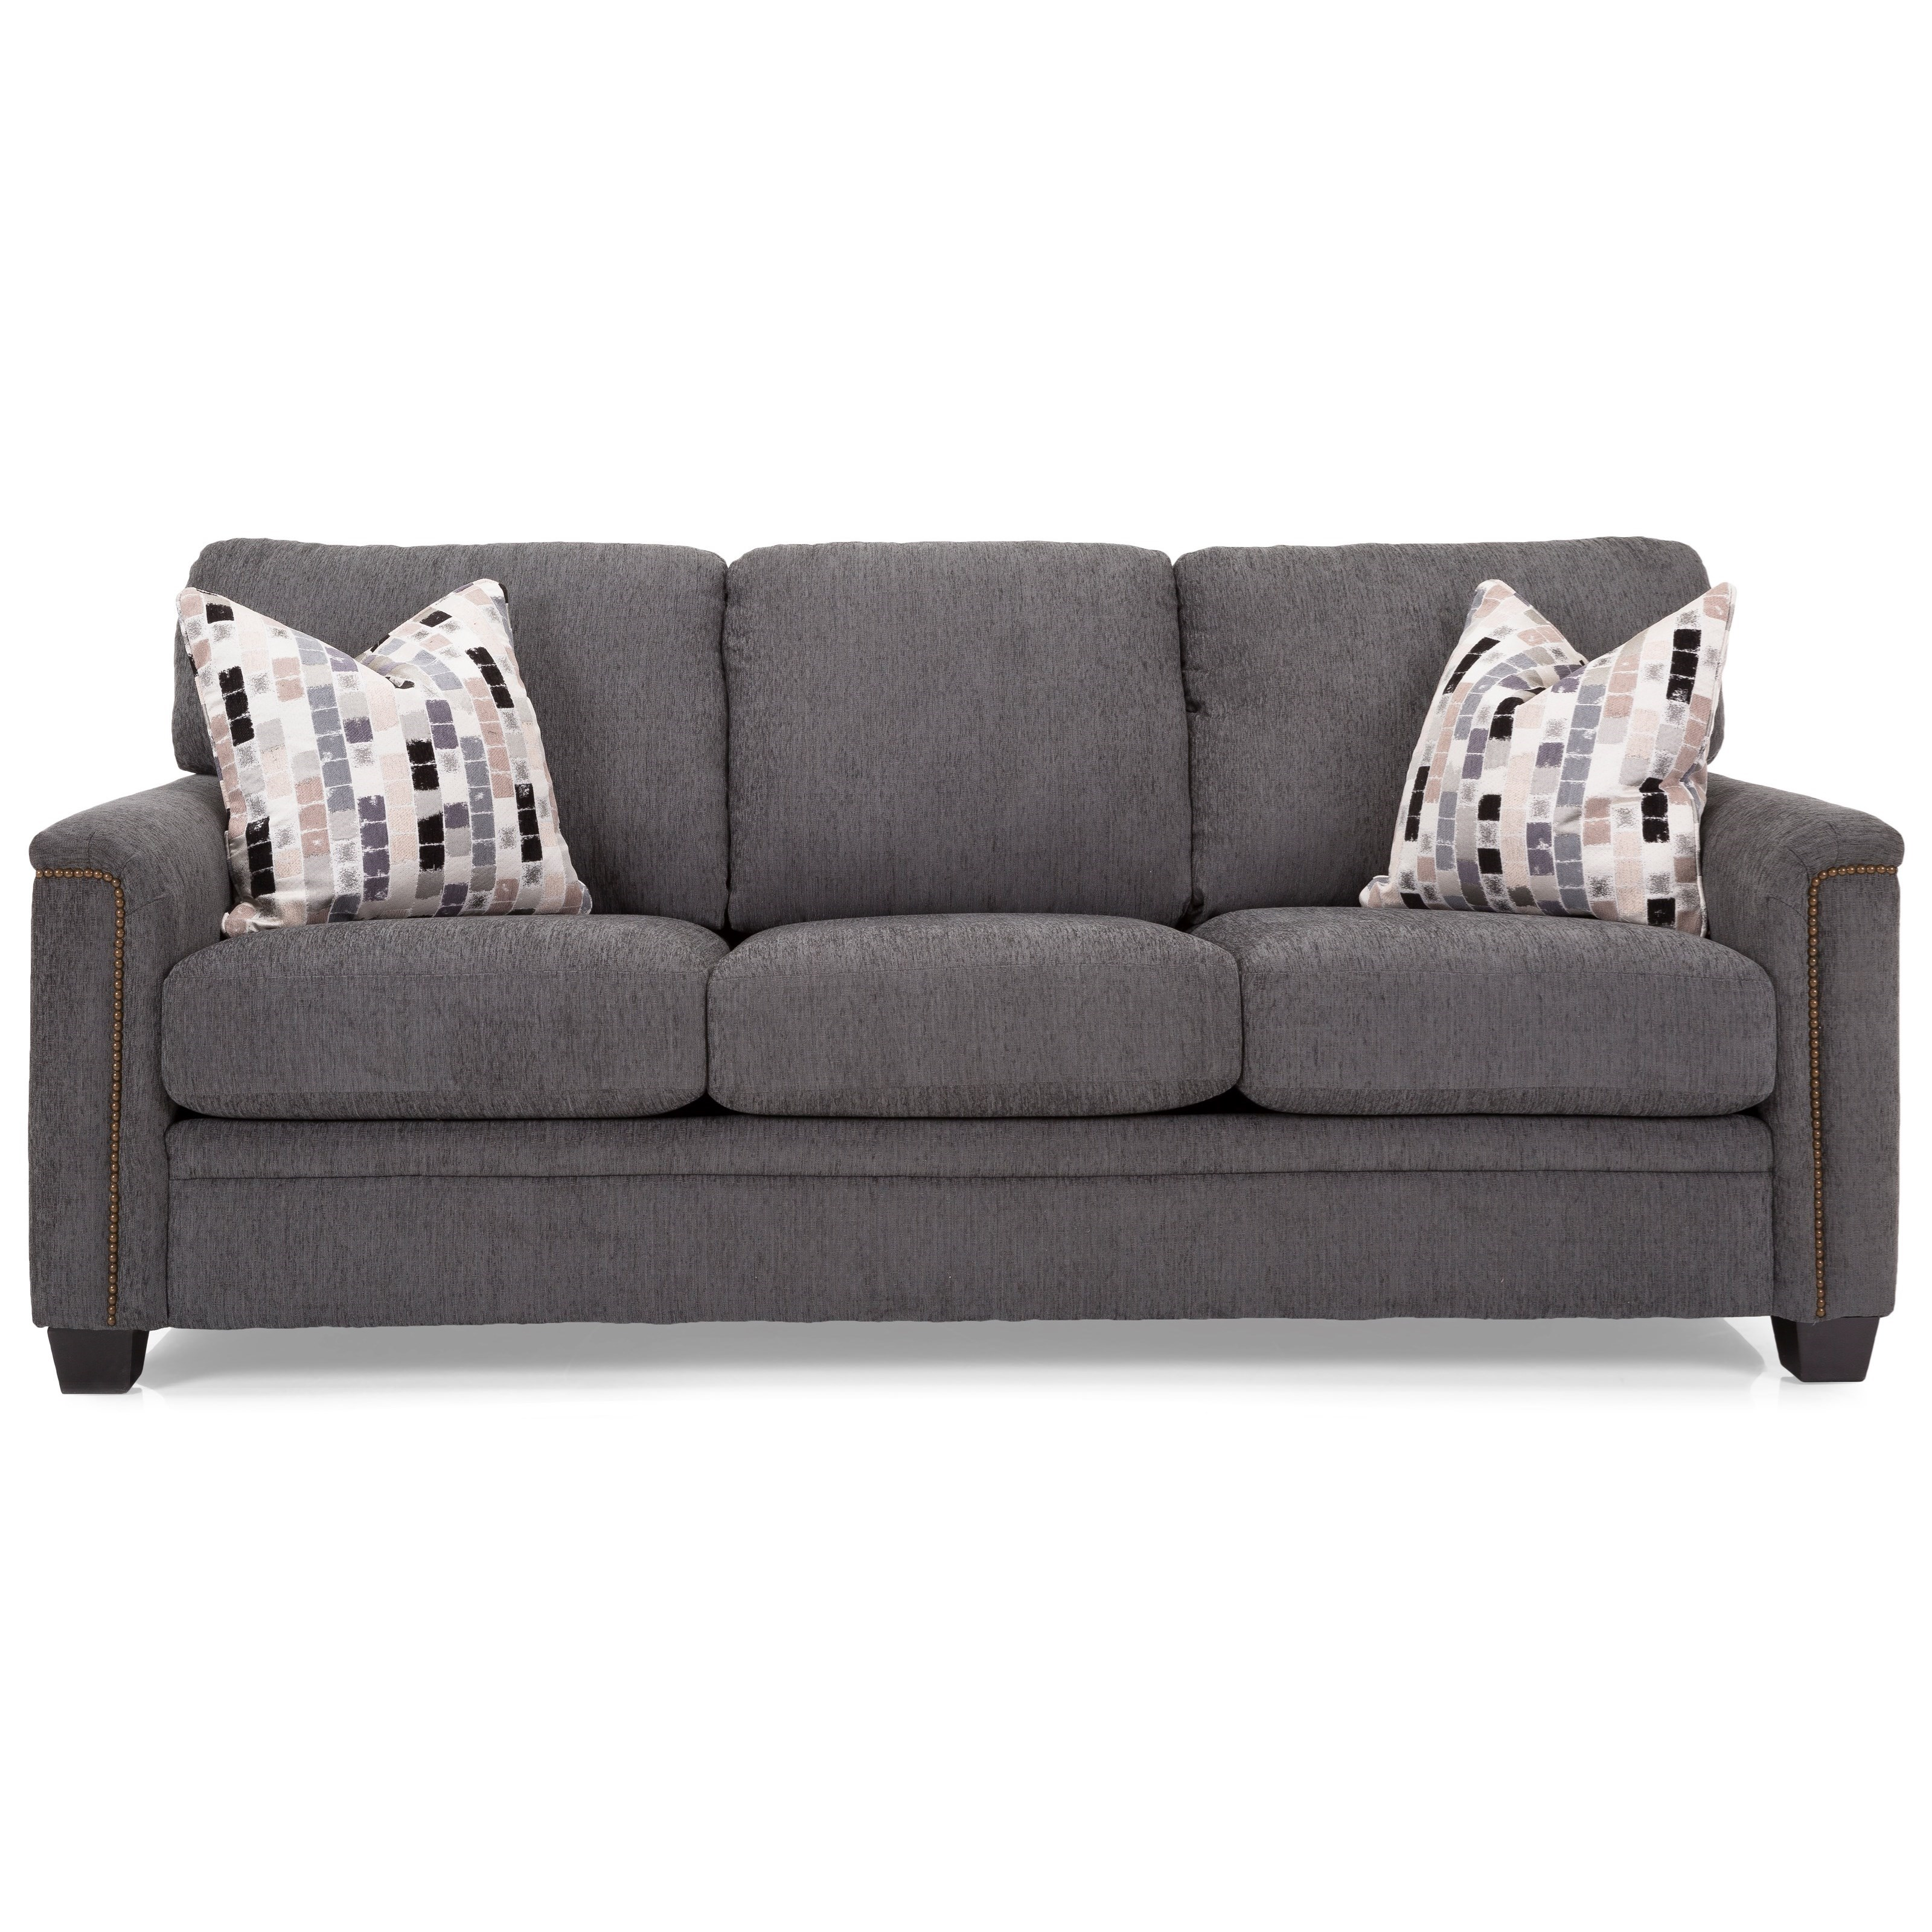 2877 Sofa by Decor-Rest at Johnny Janosik